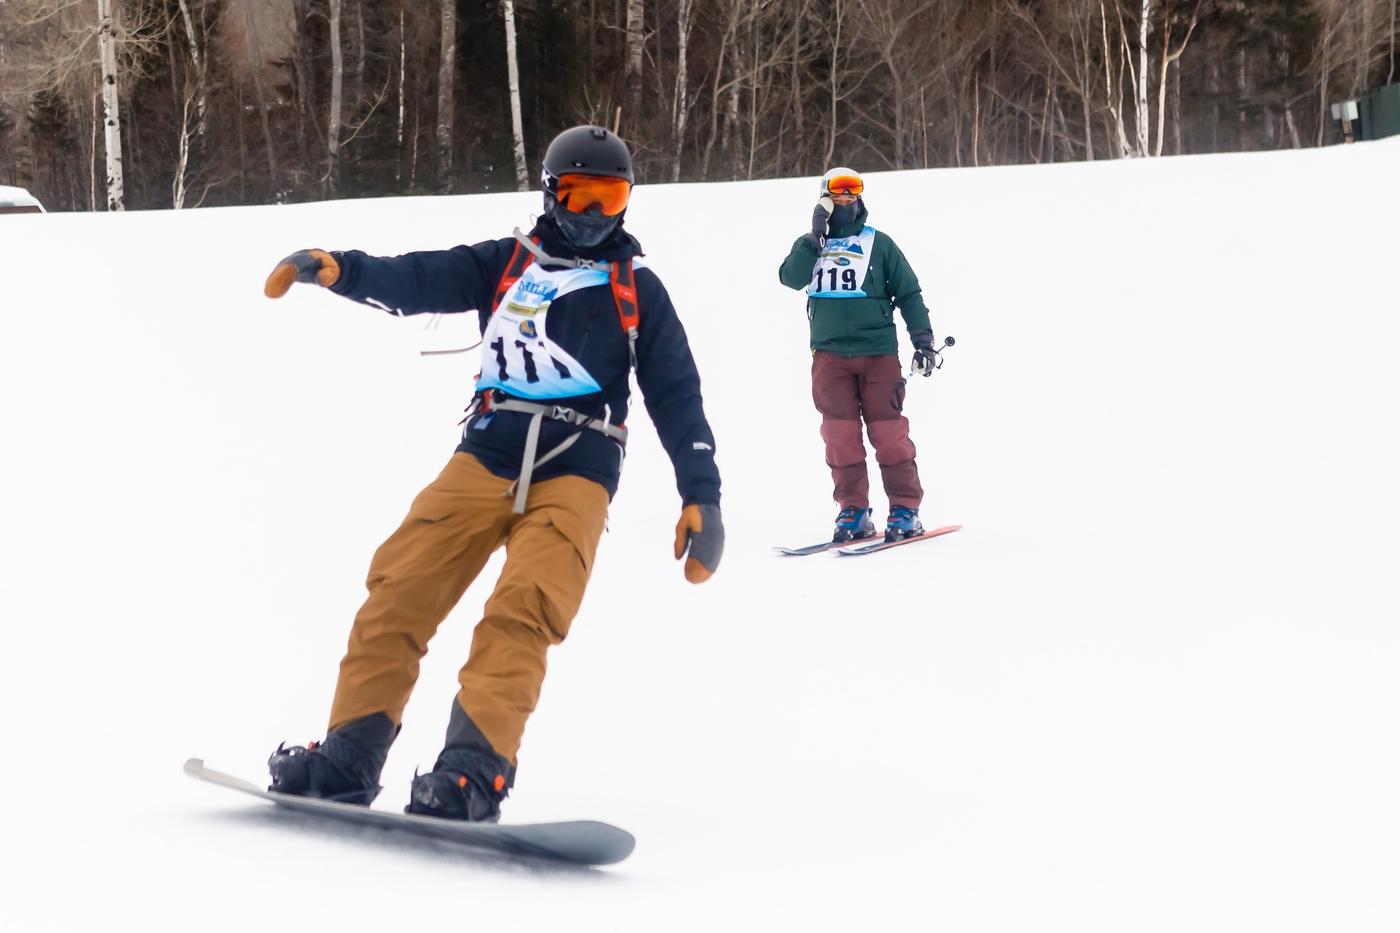 WinterKids Downhill 24 2021 SDP 2818